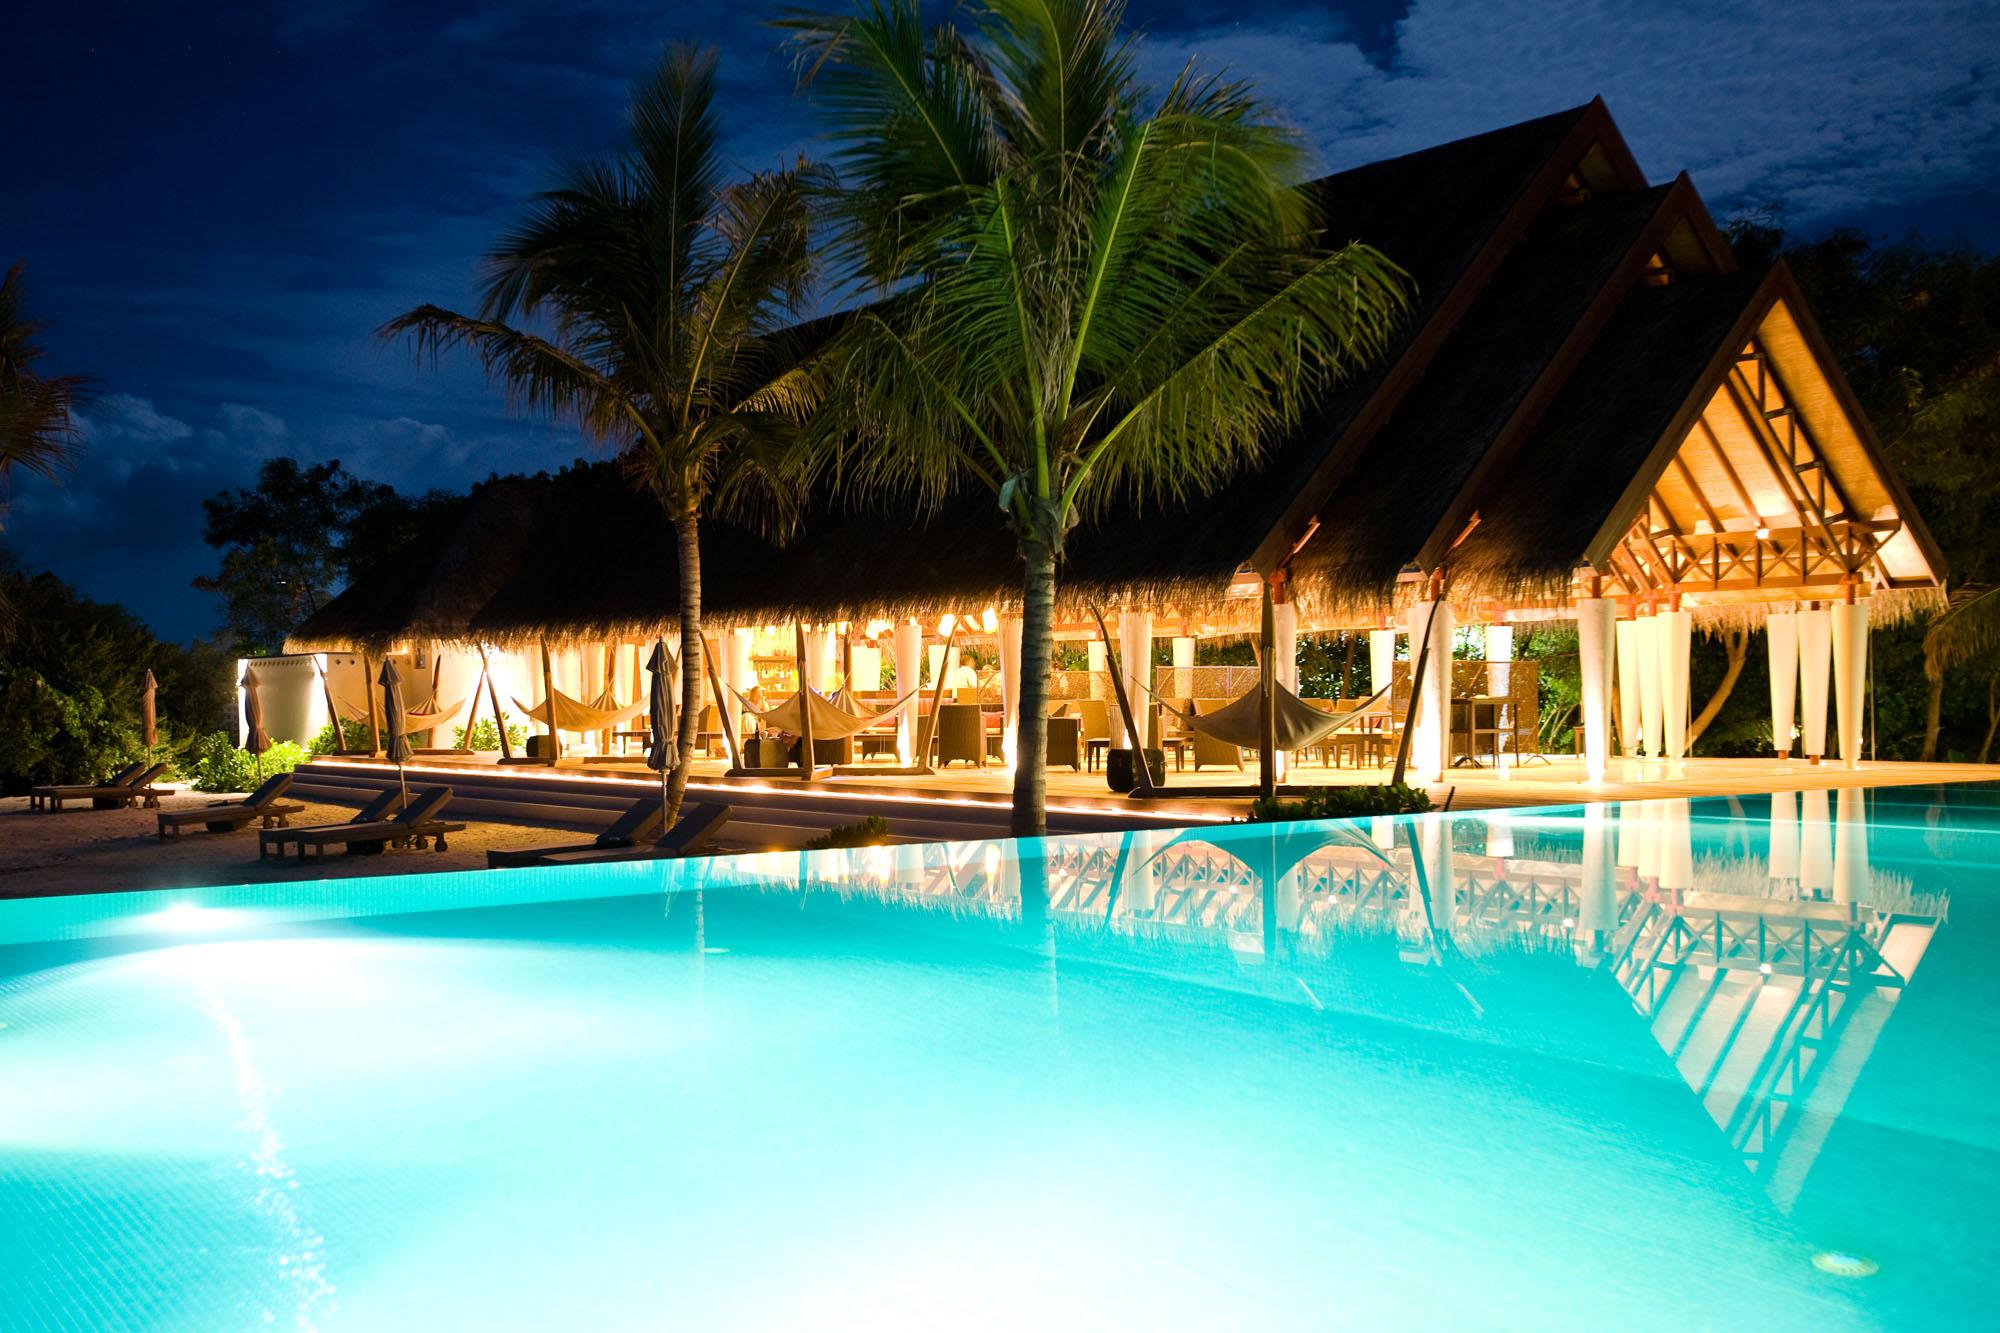 5 Star LUX Maldives Resort  Architecture  Design